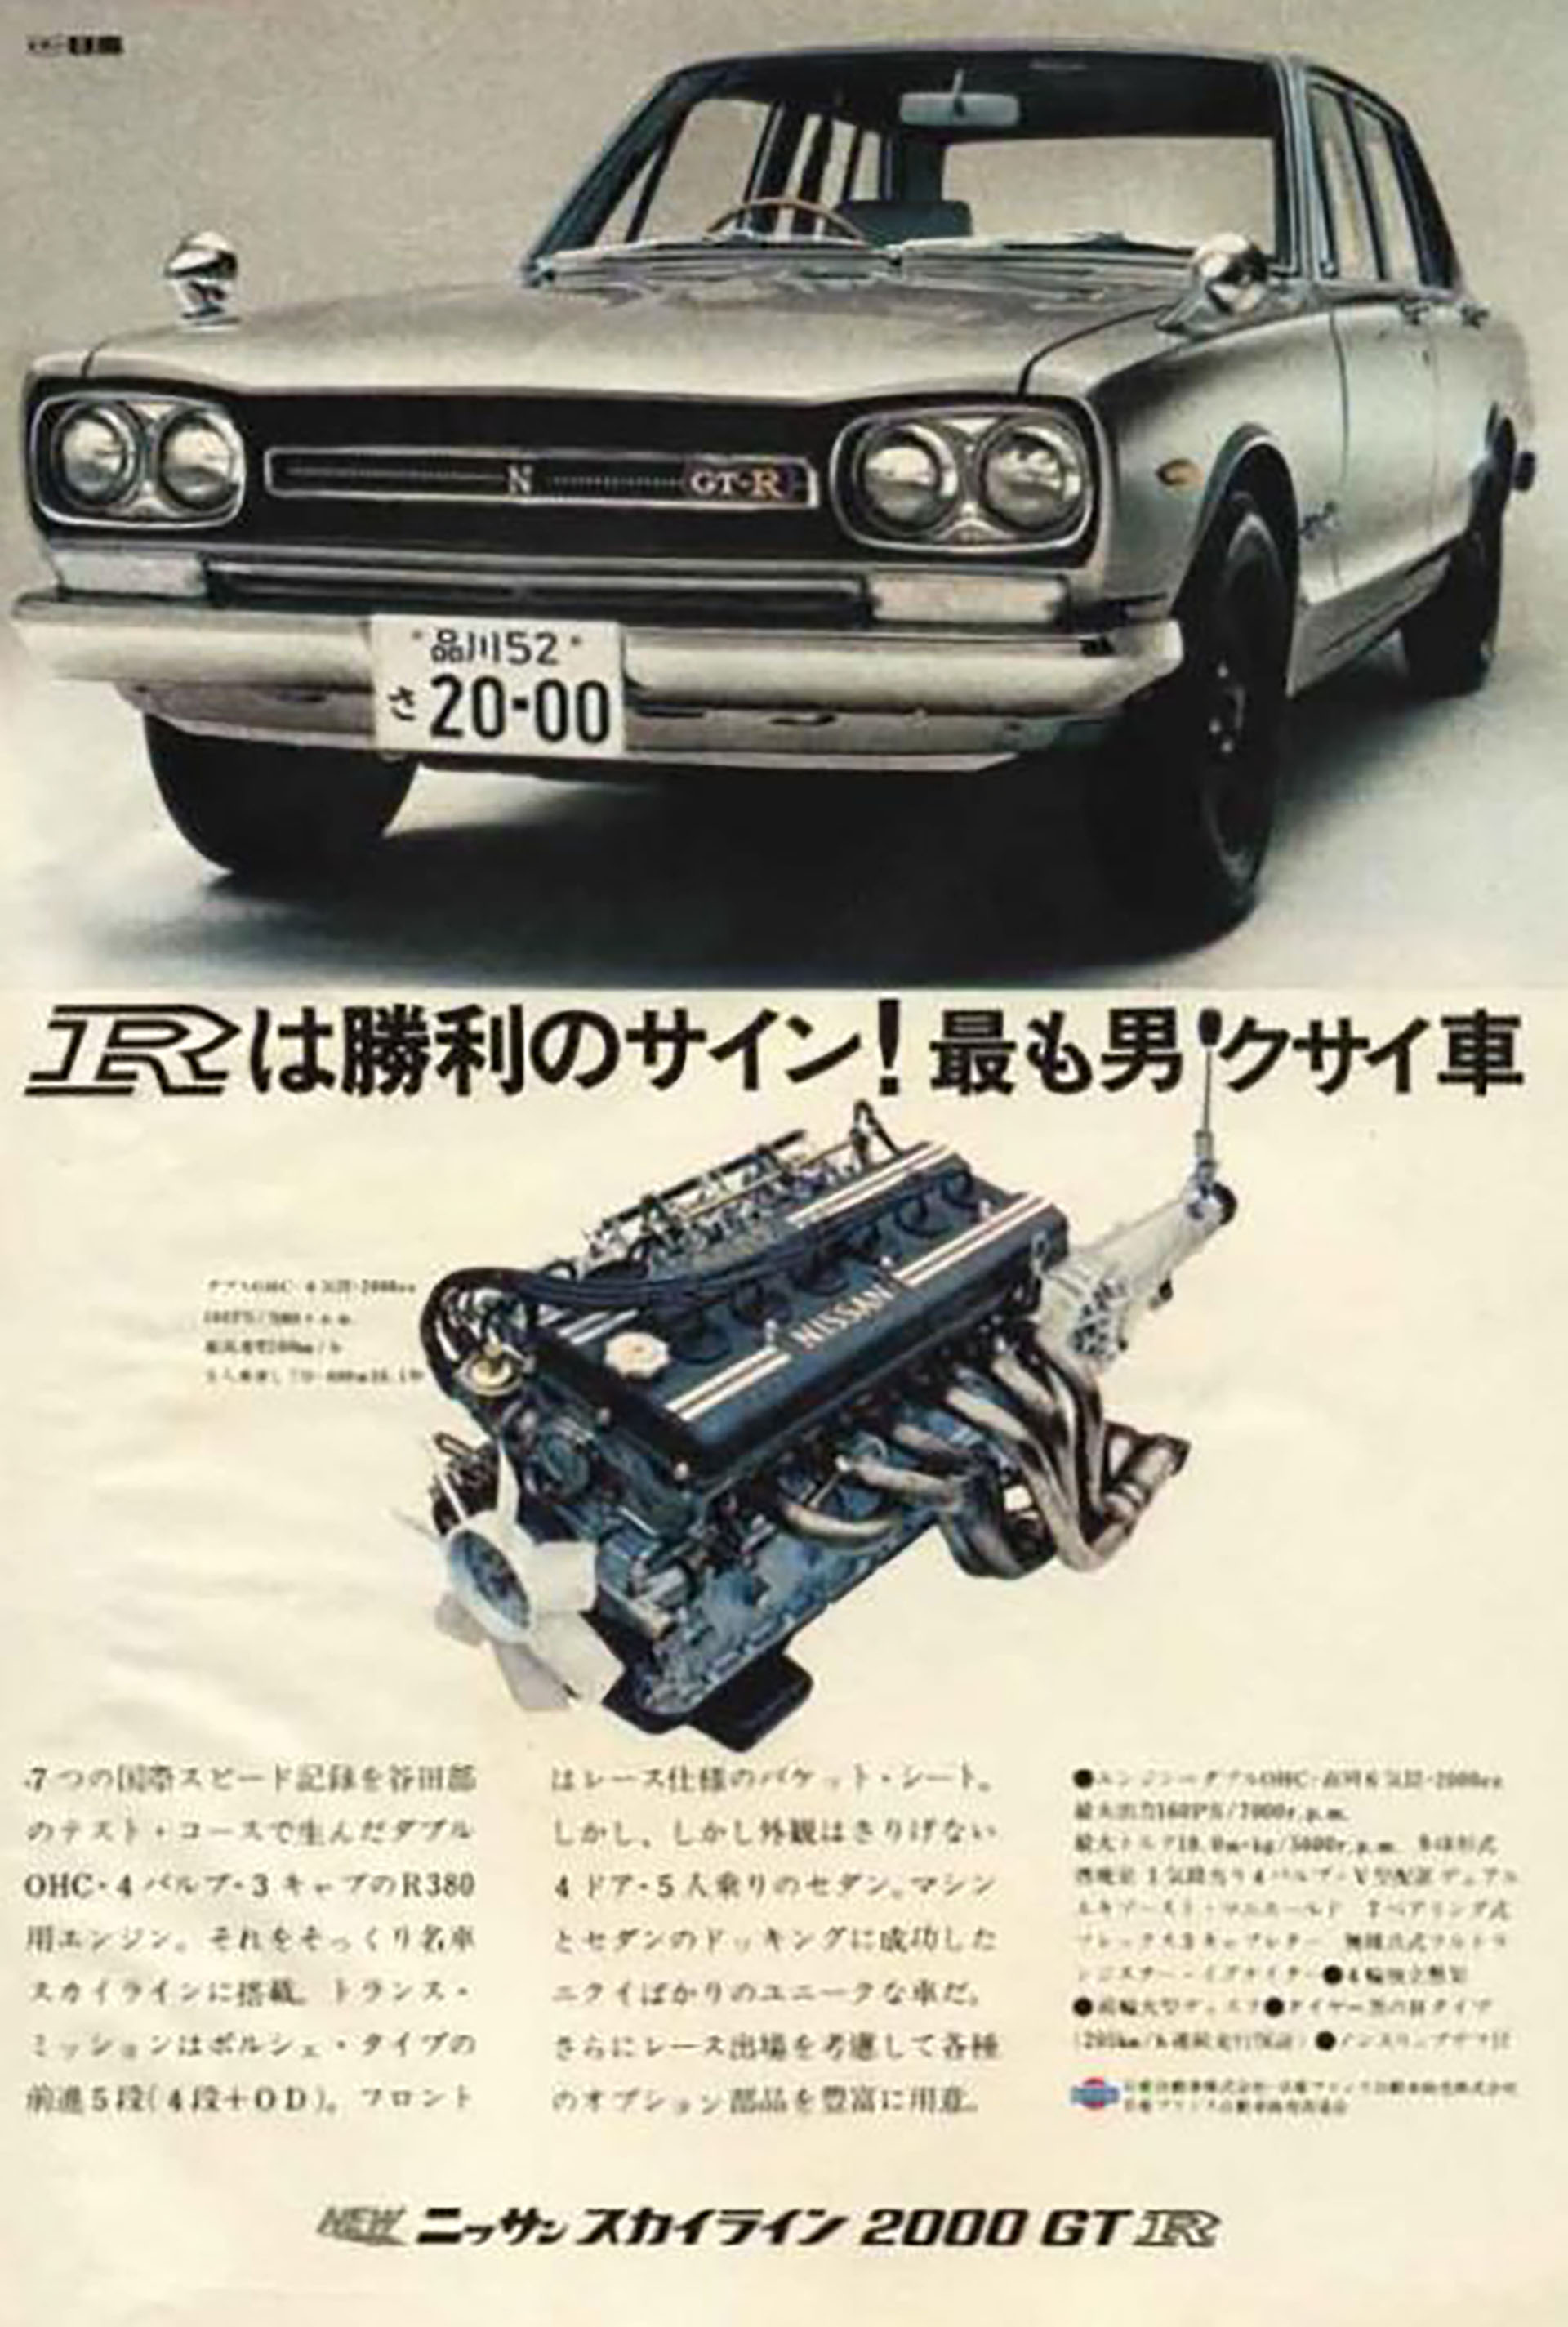 Vintage GT-R advertisement